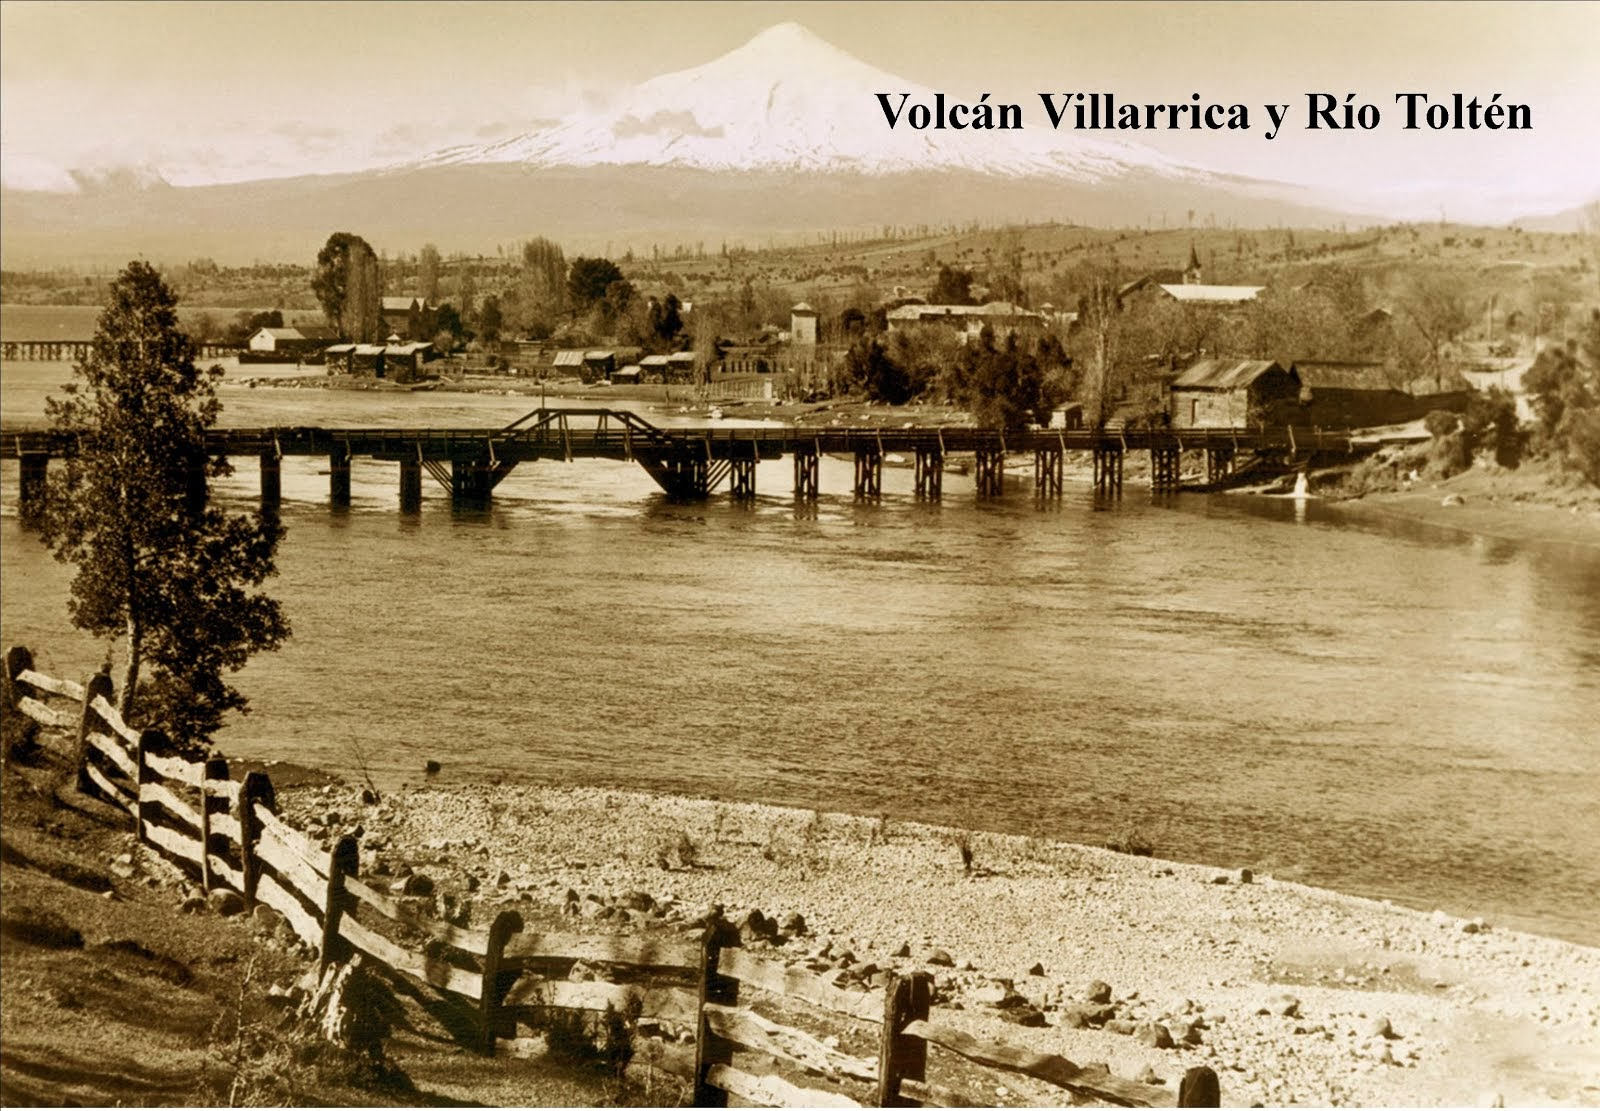 Gorbea, Villarrica y Toltén